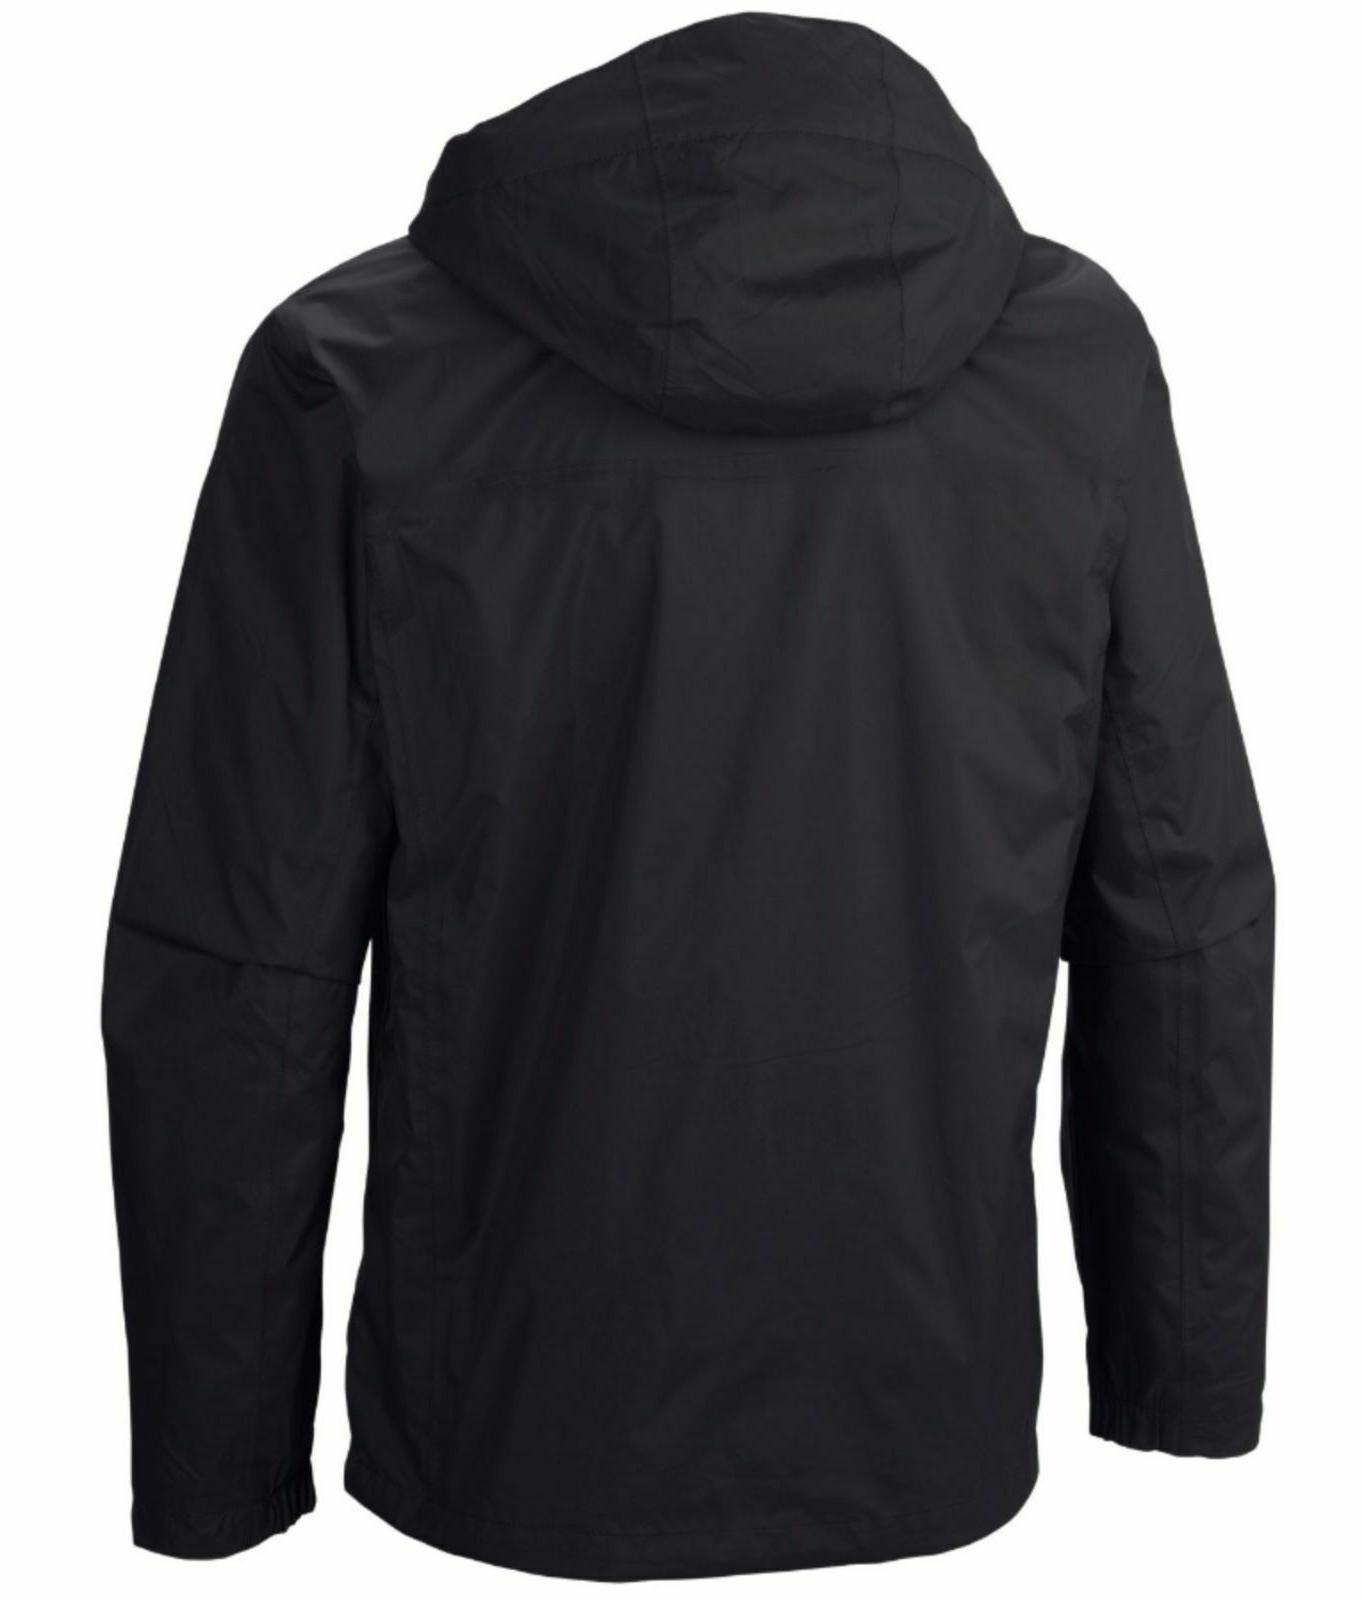 New Timber Pointe waterproof hooded rain Black Tall